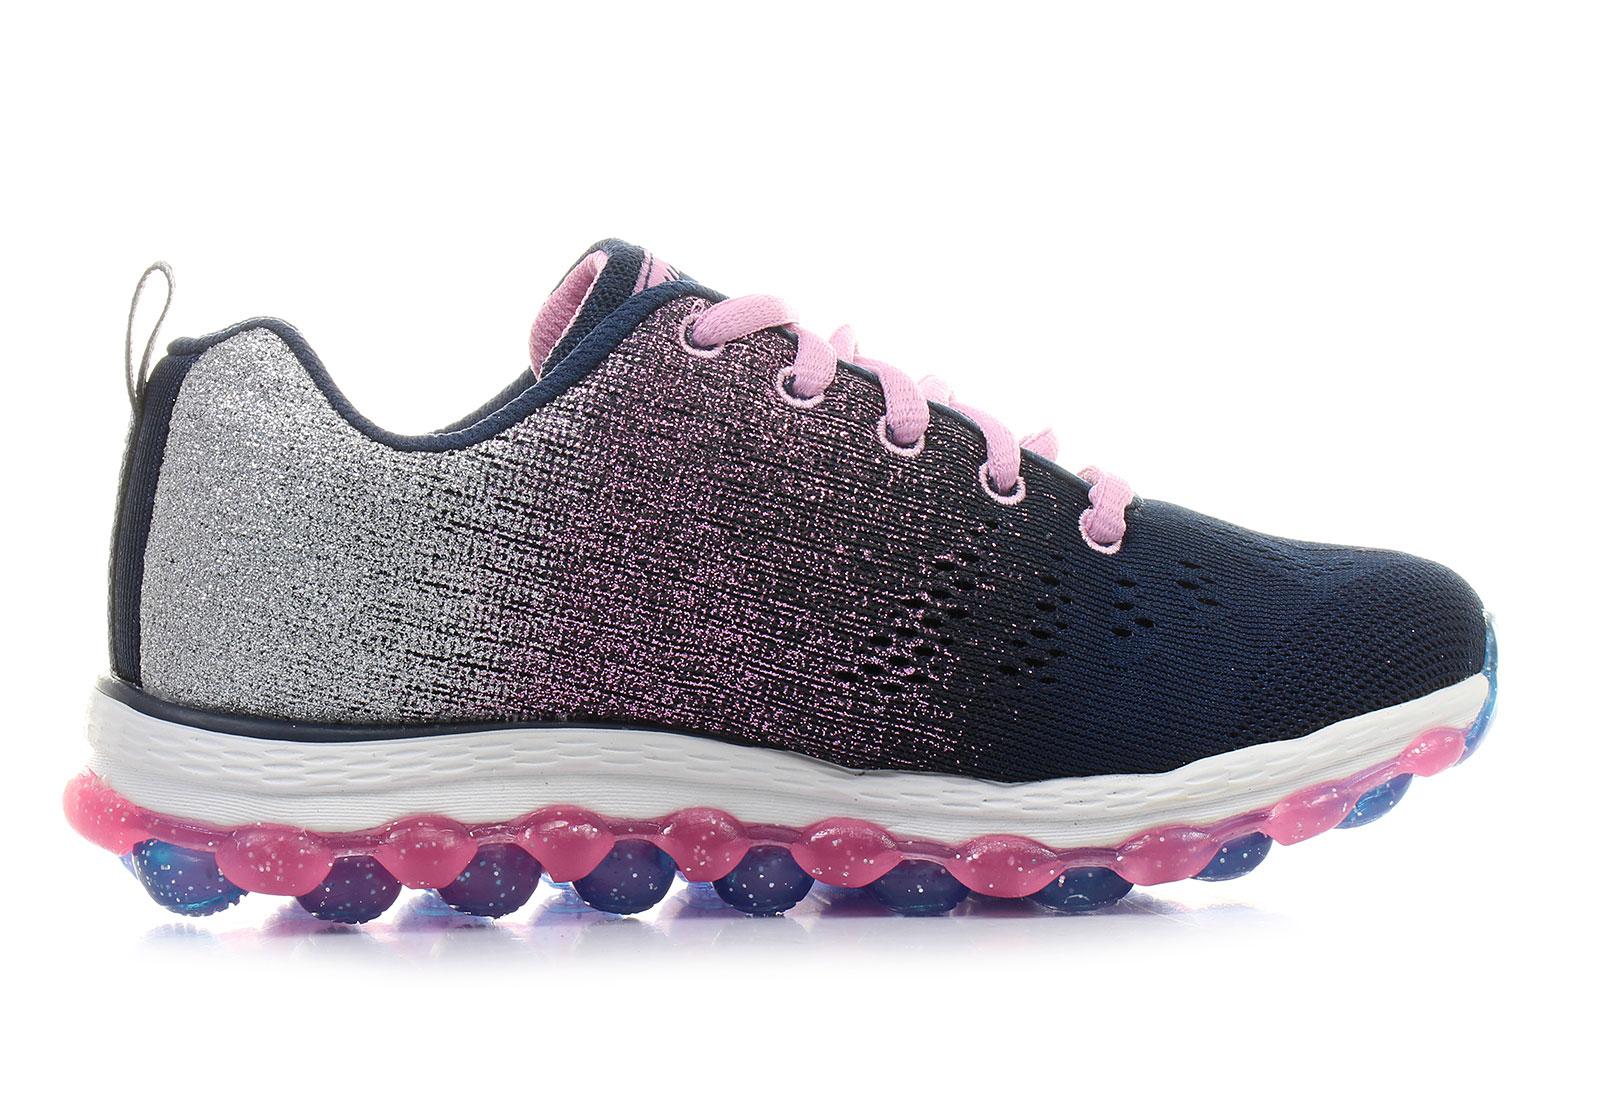 6d2915e232fd Skechers Shoes - Glitterbeam - 80035L-nvpk - Online shop for ...